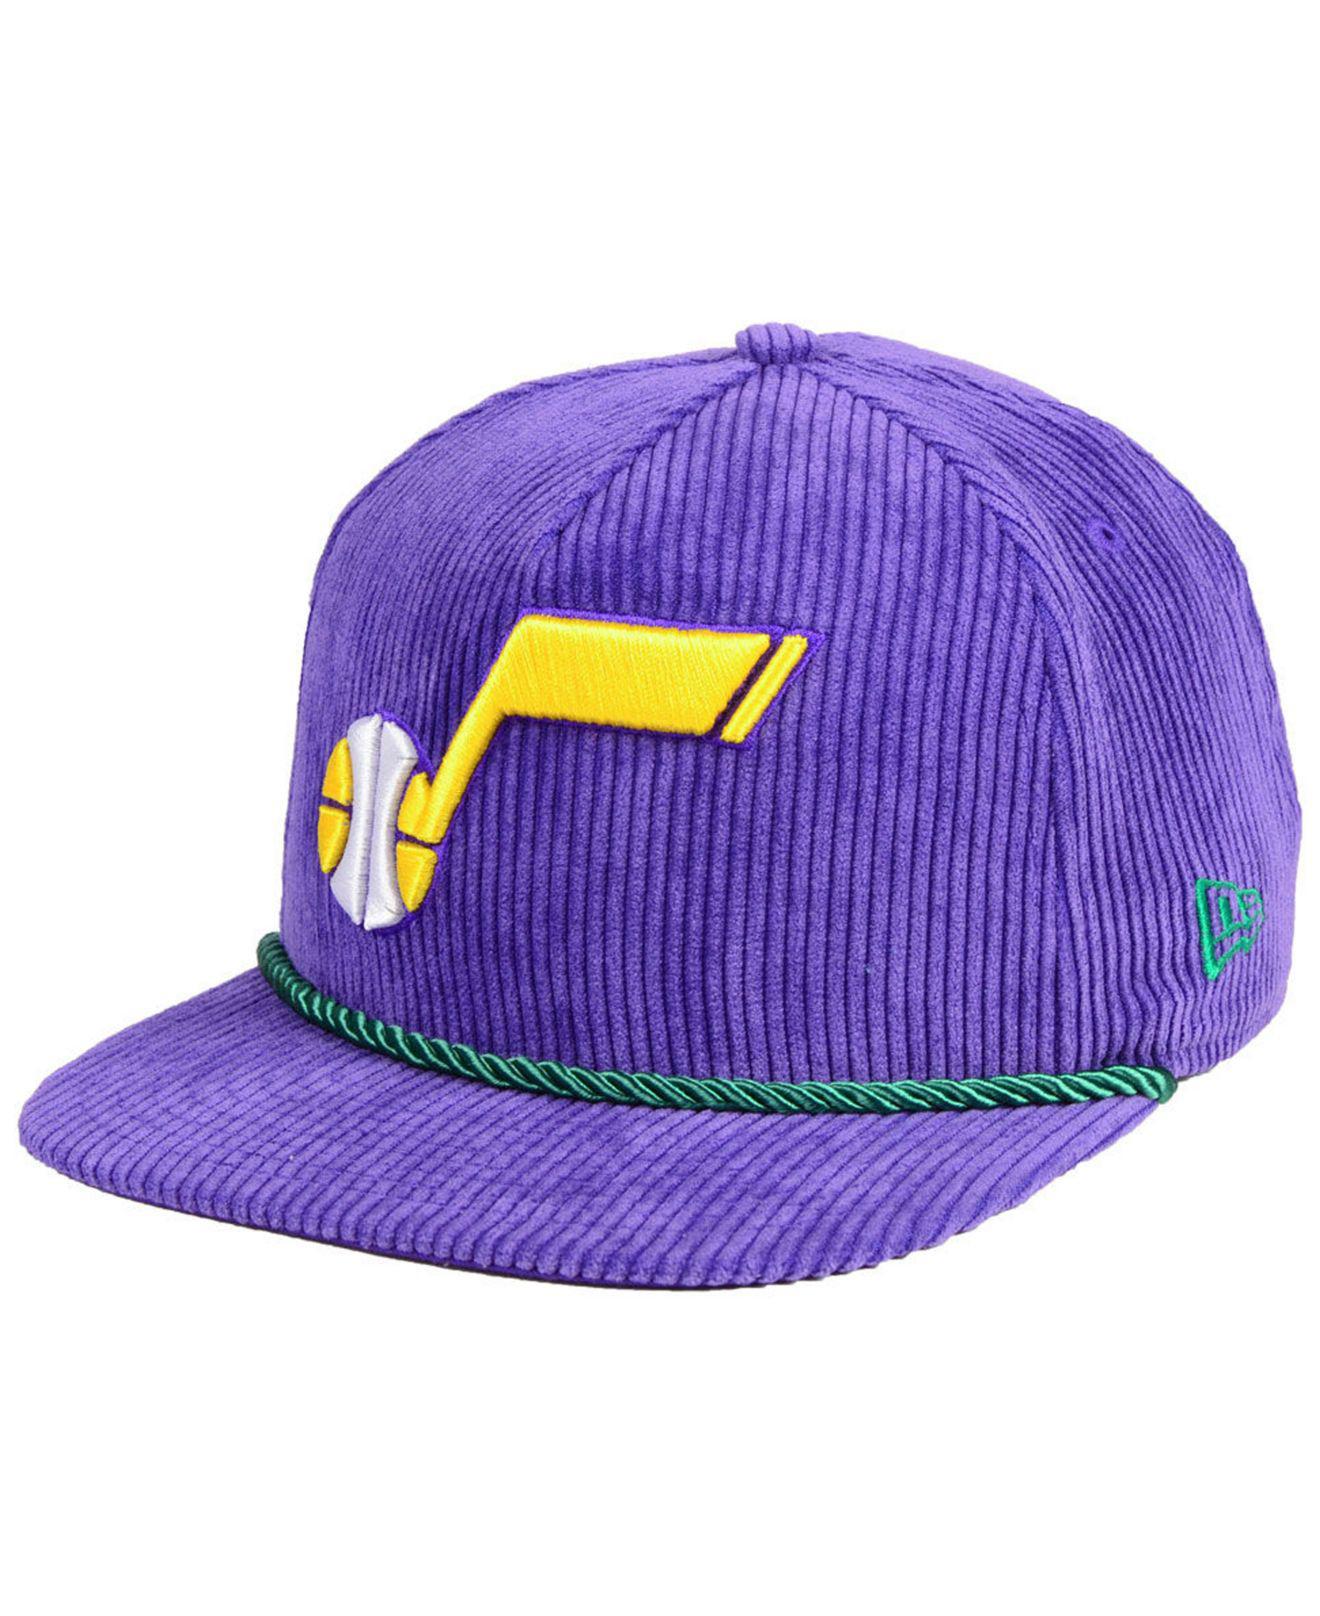 KTZ. Men s Purple Utah Jazz Hardwood Classic Nights Cords 9fifty Snapback  Cap 44a42e062